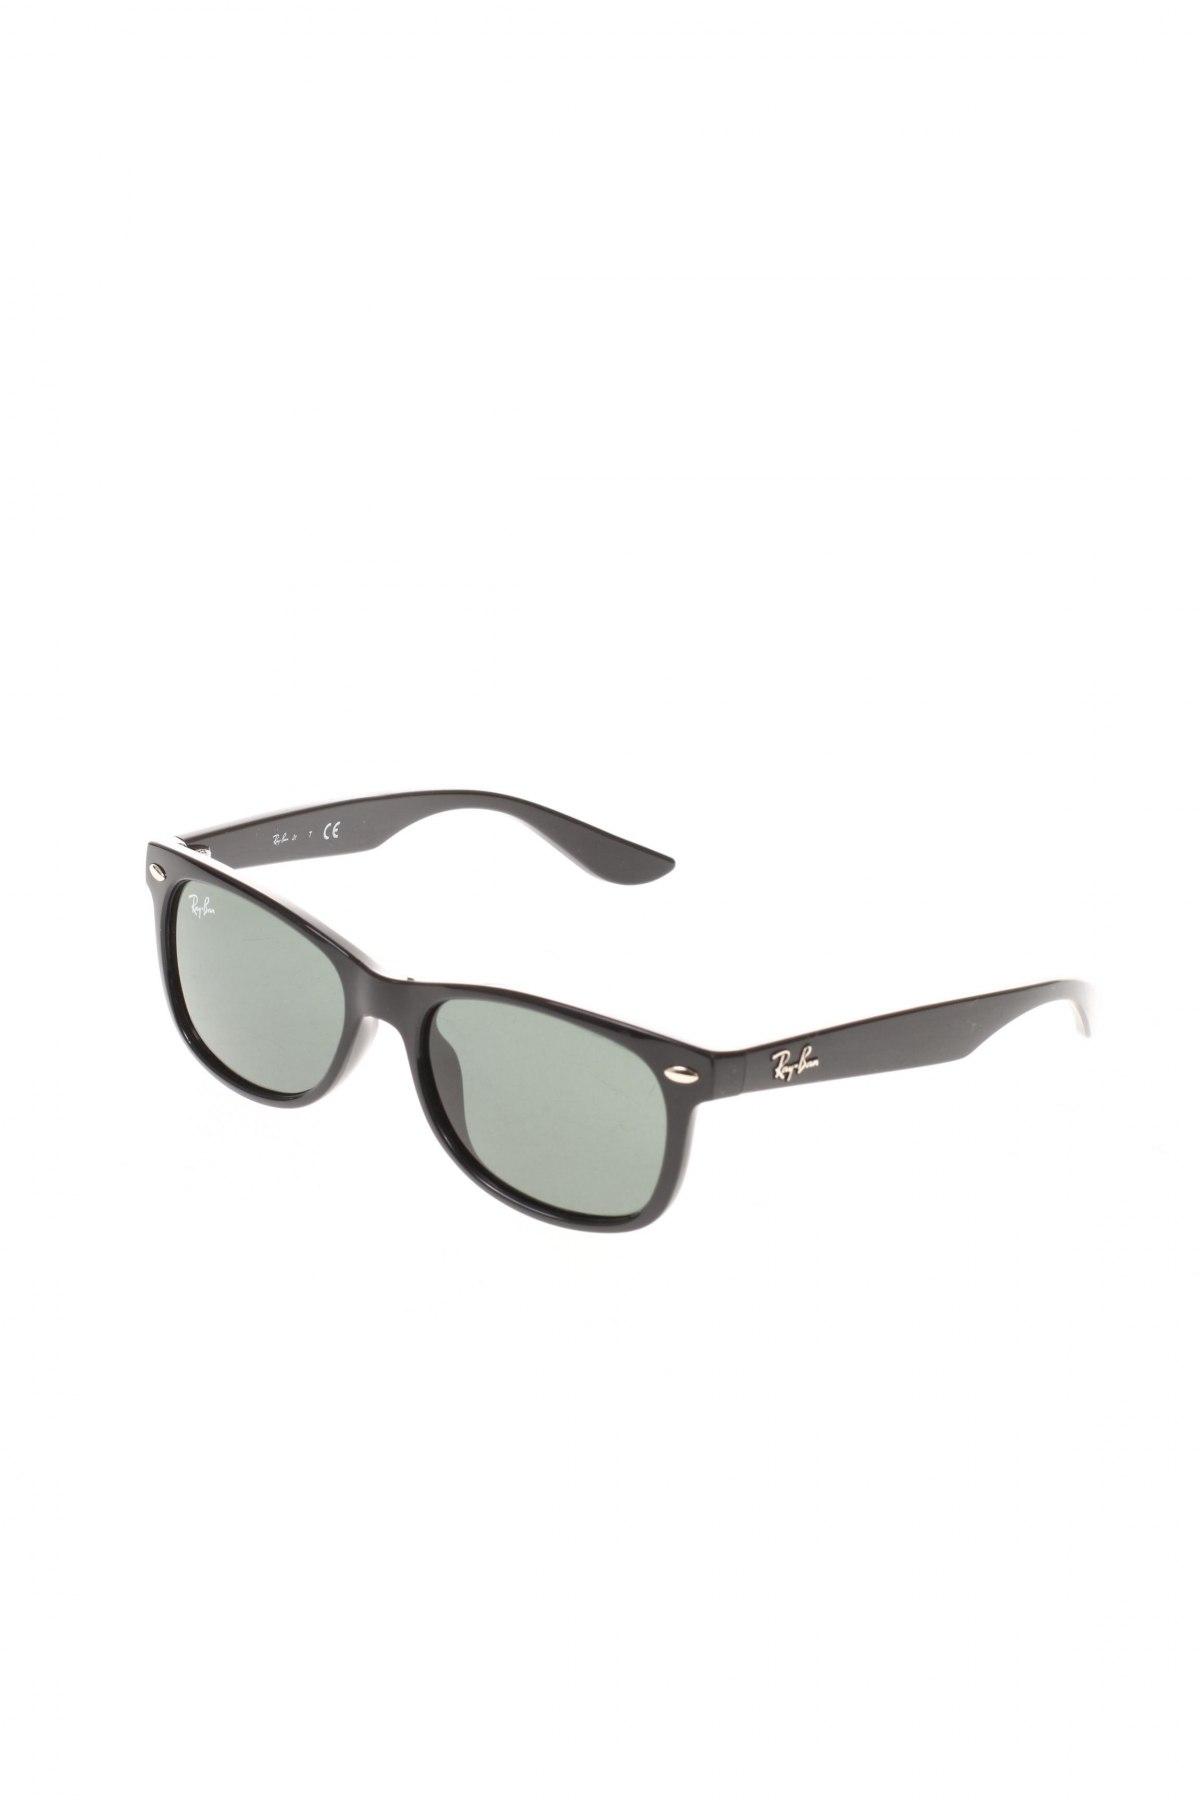 6ffbb8b702 Γυαλιά ηλίου Ray Ban Junior - σε συμφέρουσα τιμή στο Remix -  6984300